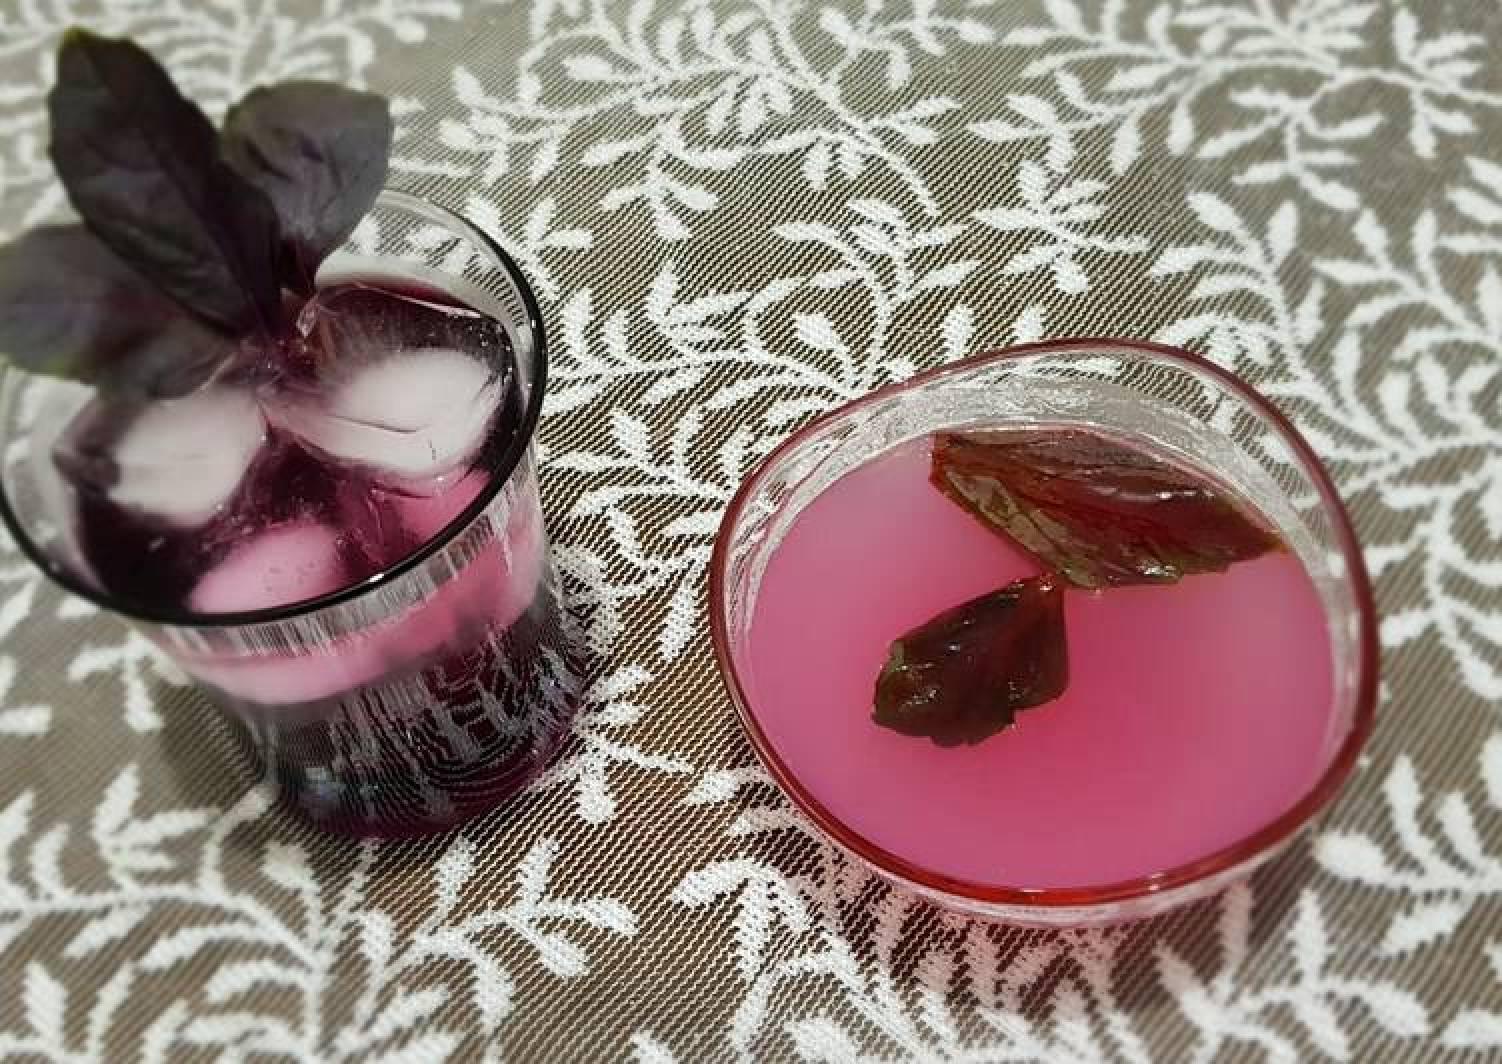 Basil sherbet & jelly #mycookbook